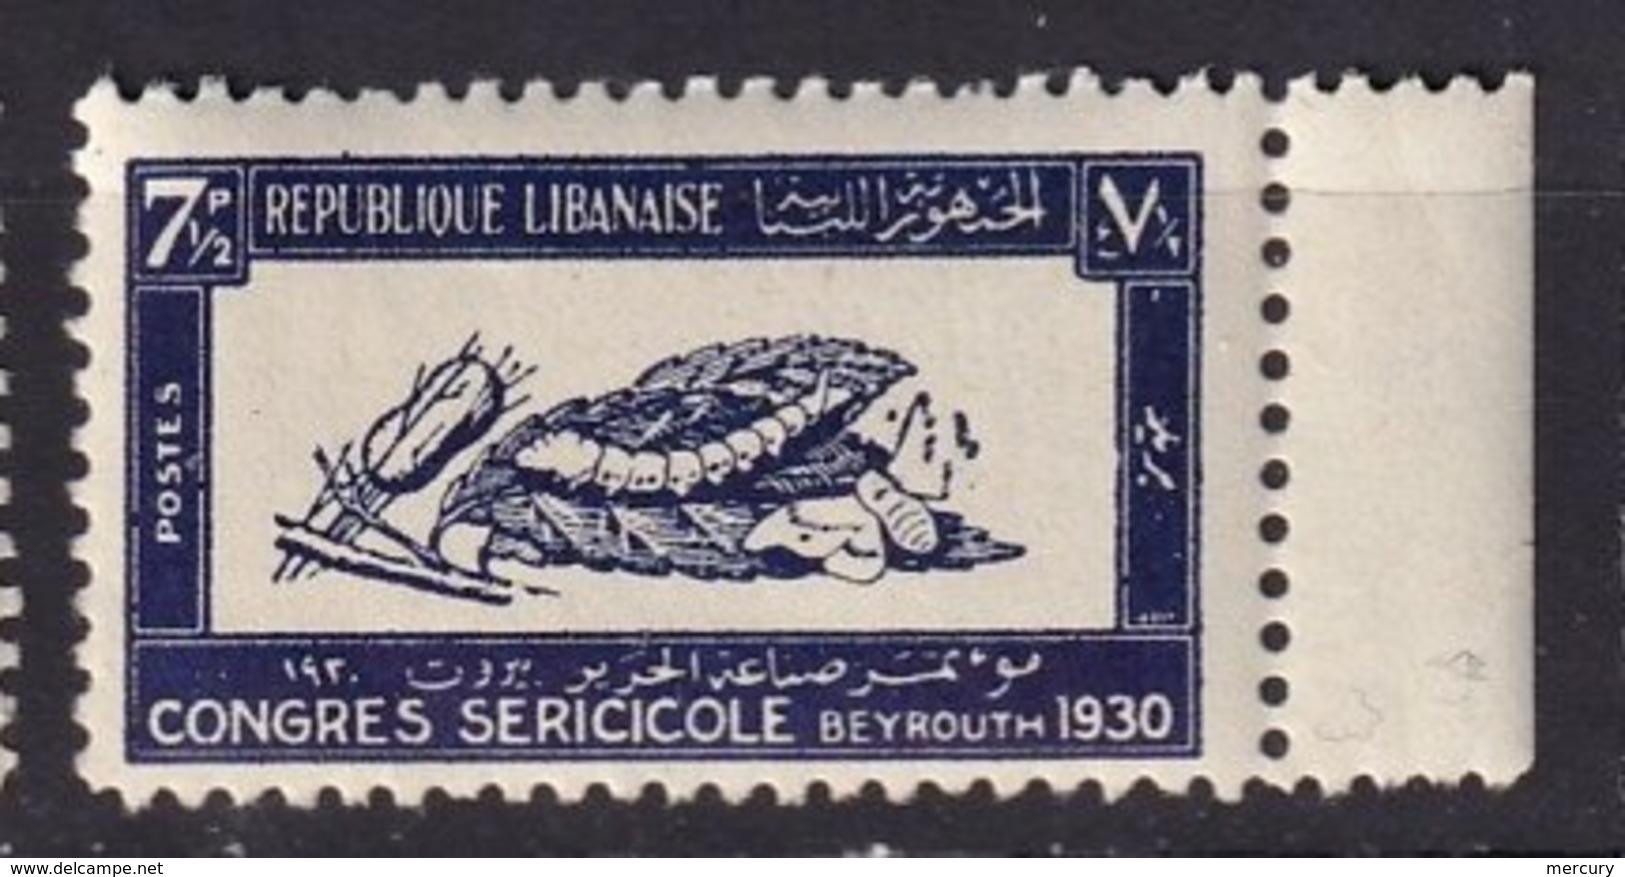 GRAND-LIBAN - 7 Pi. Vers à Soie Neuf - Neufs